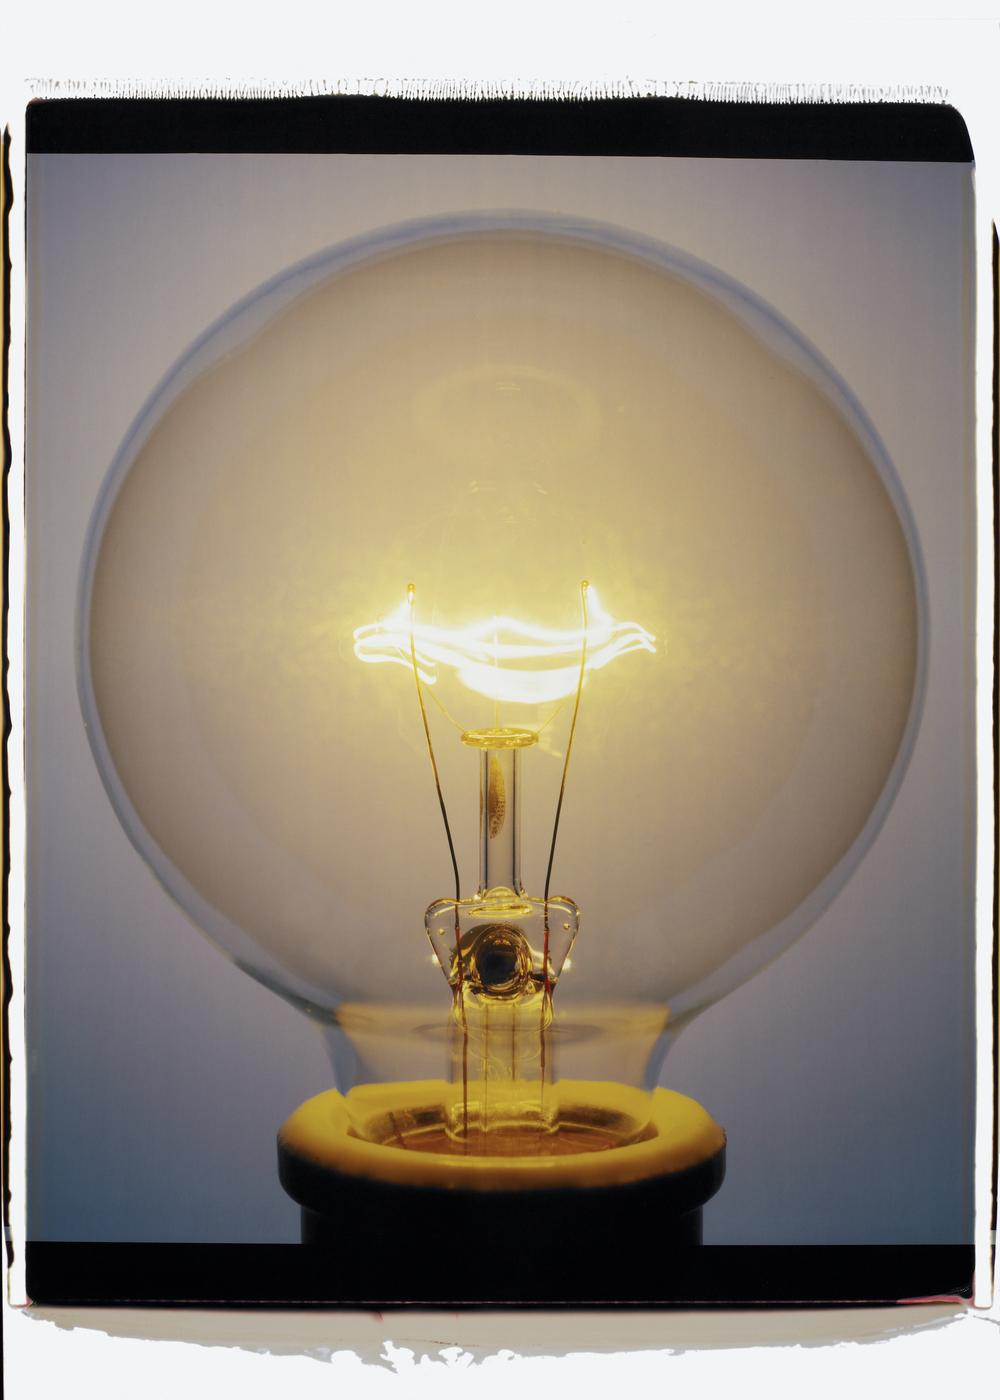 artist statements catalogue essays amanda means light bulb 015ybc 2007 color polaroid